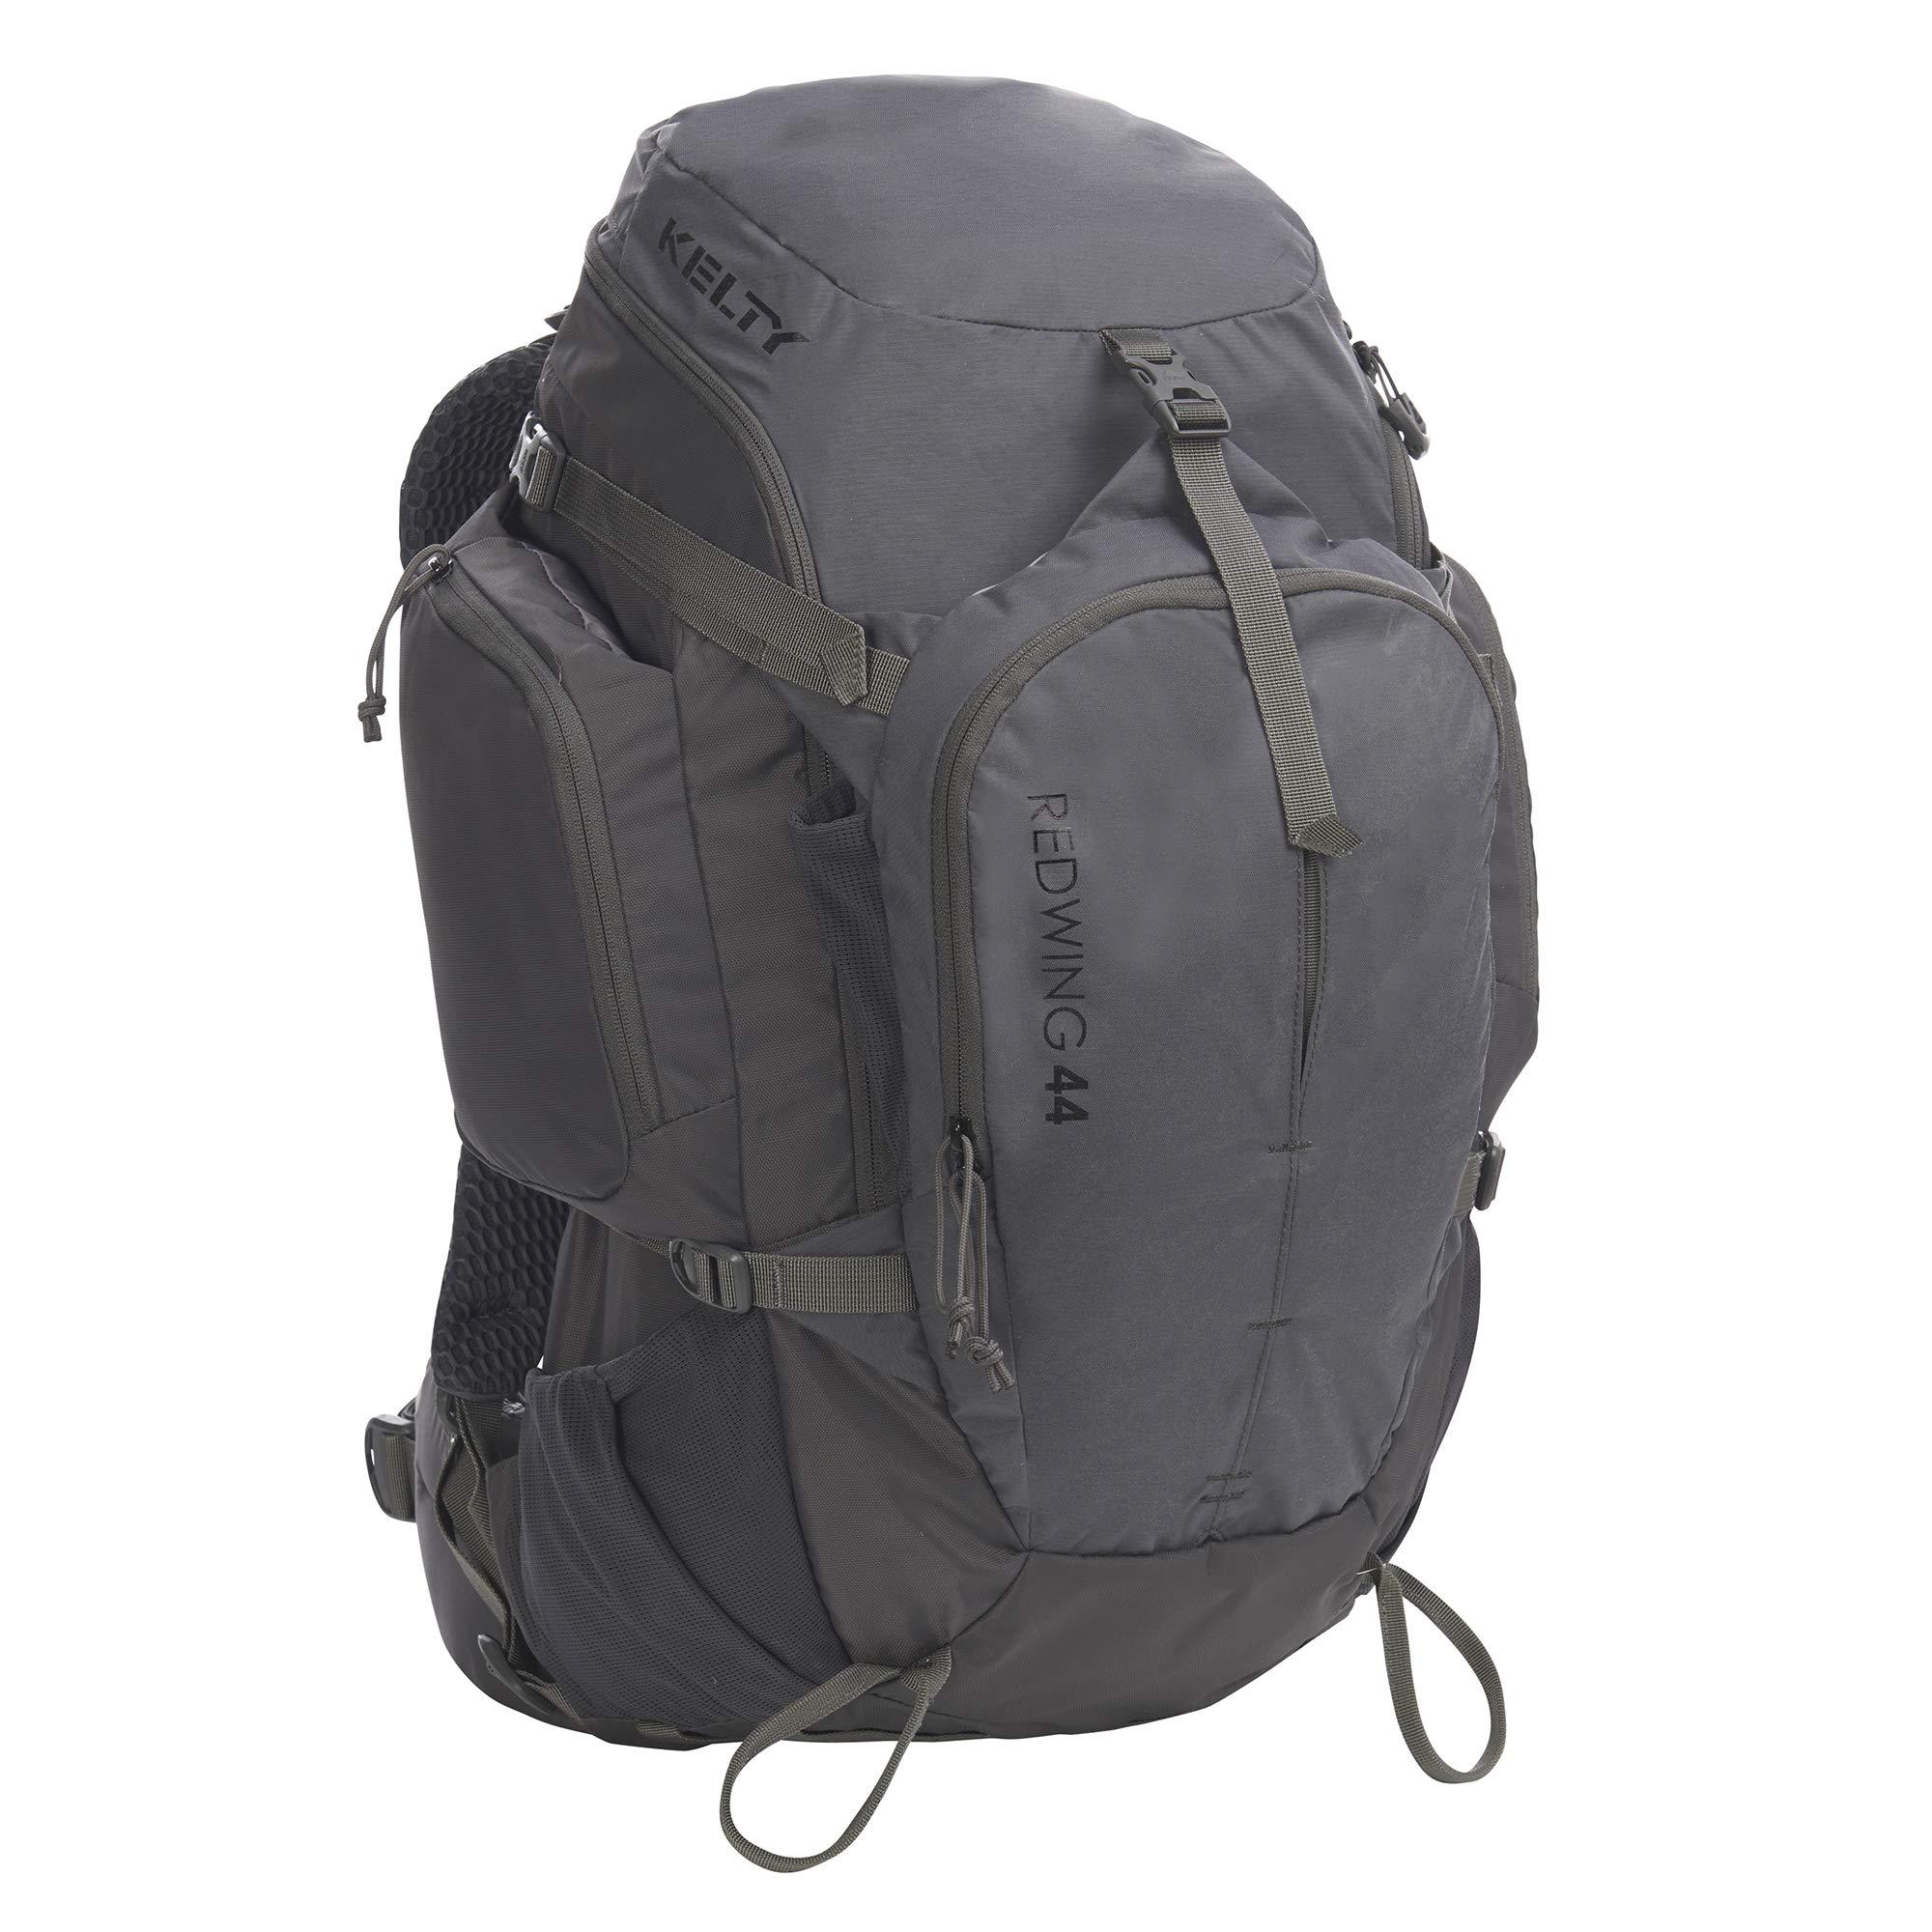 Kelty Redwing 44 Backpack - Dark Shadow